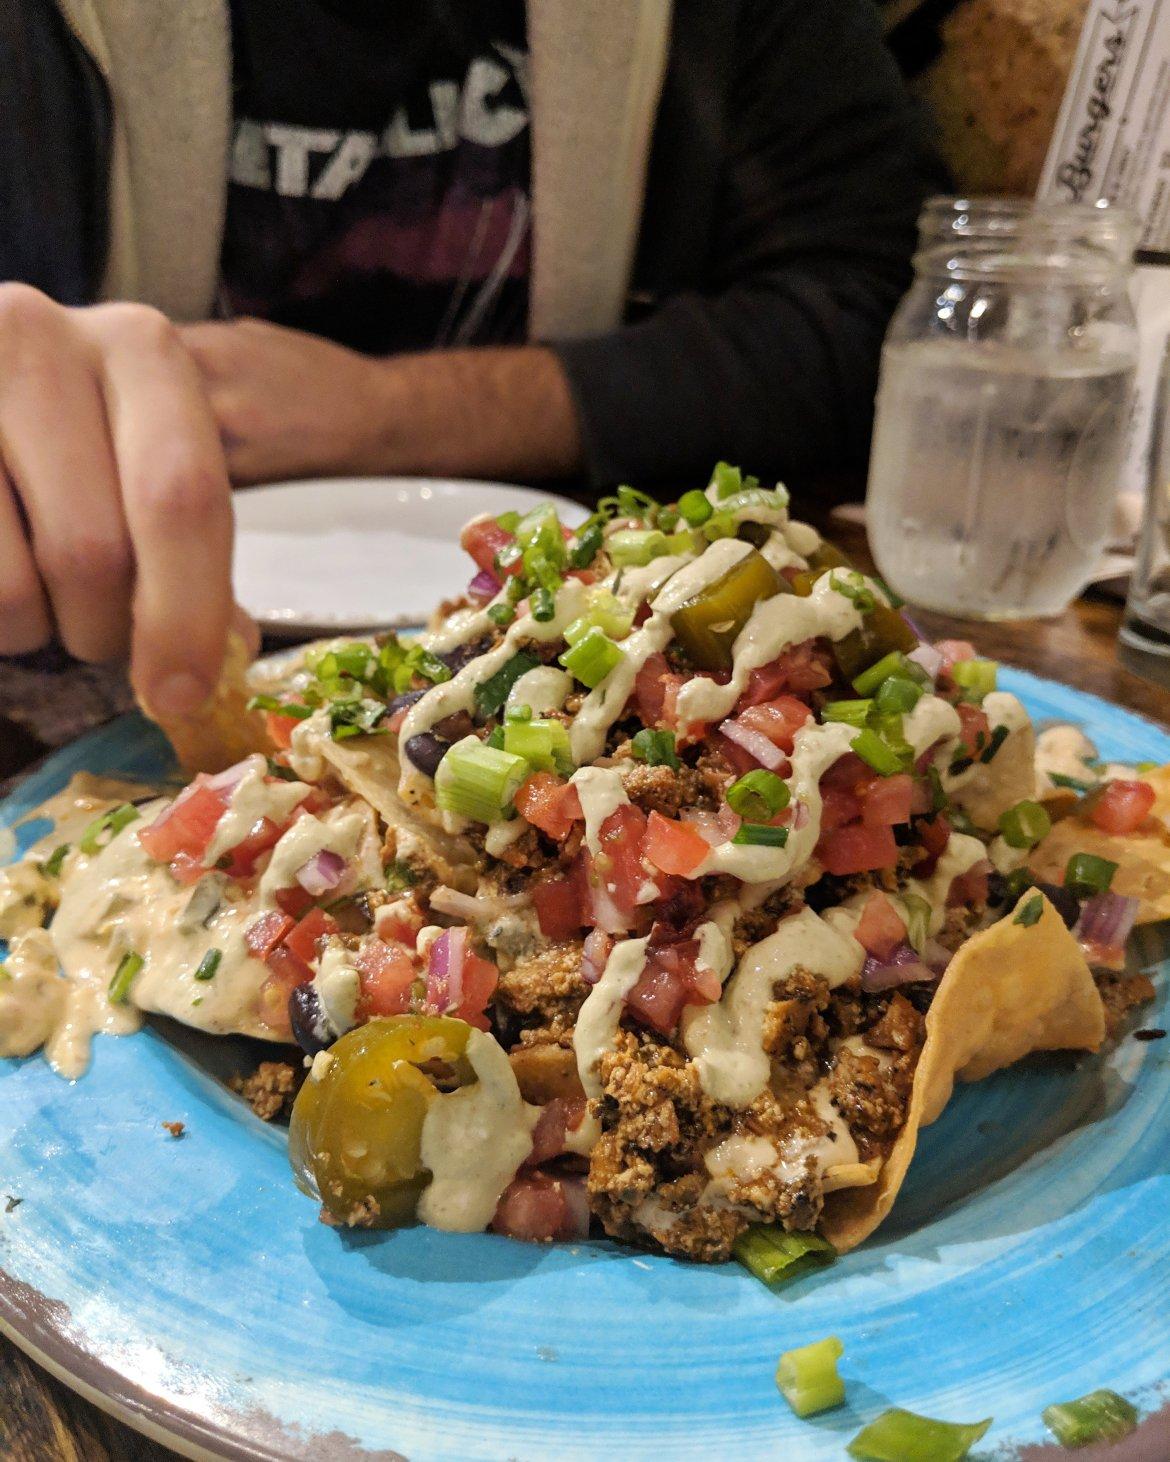 Vegan nachos at Crafted in Greensboro, NC